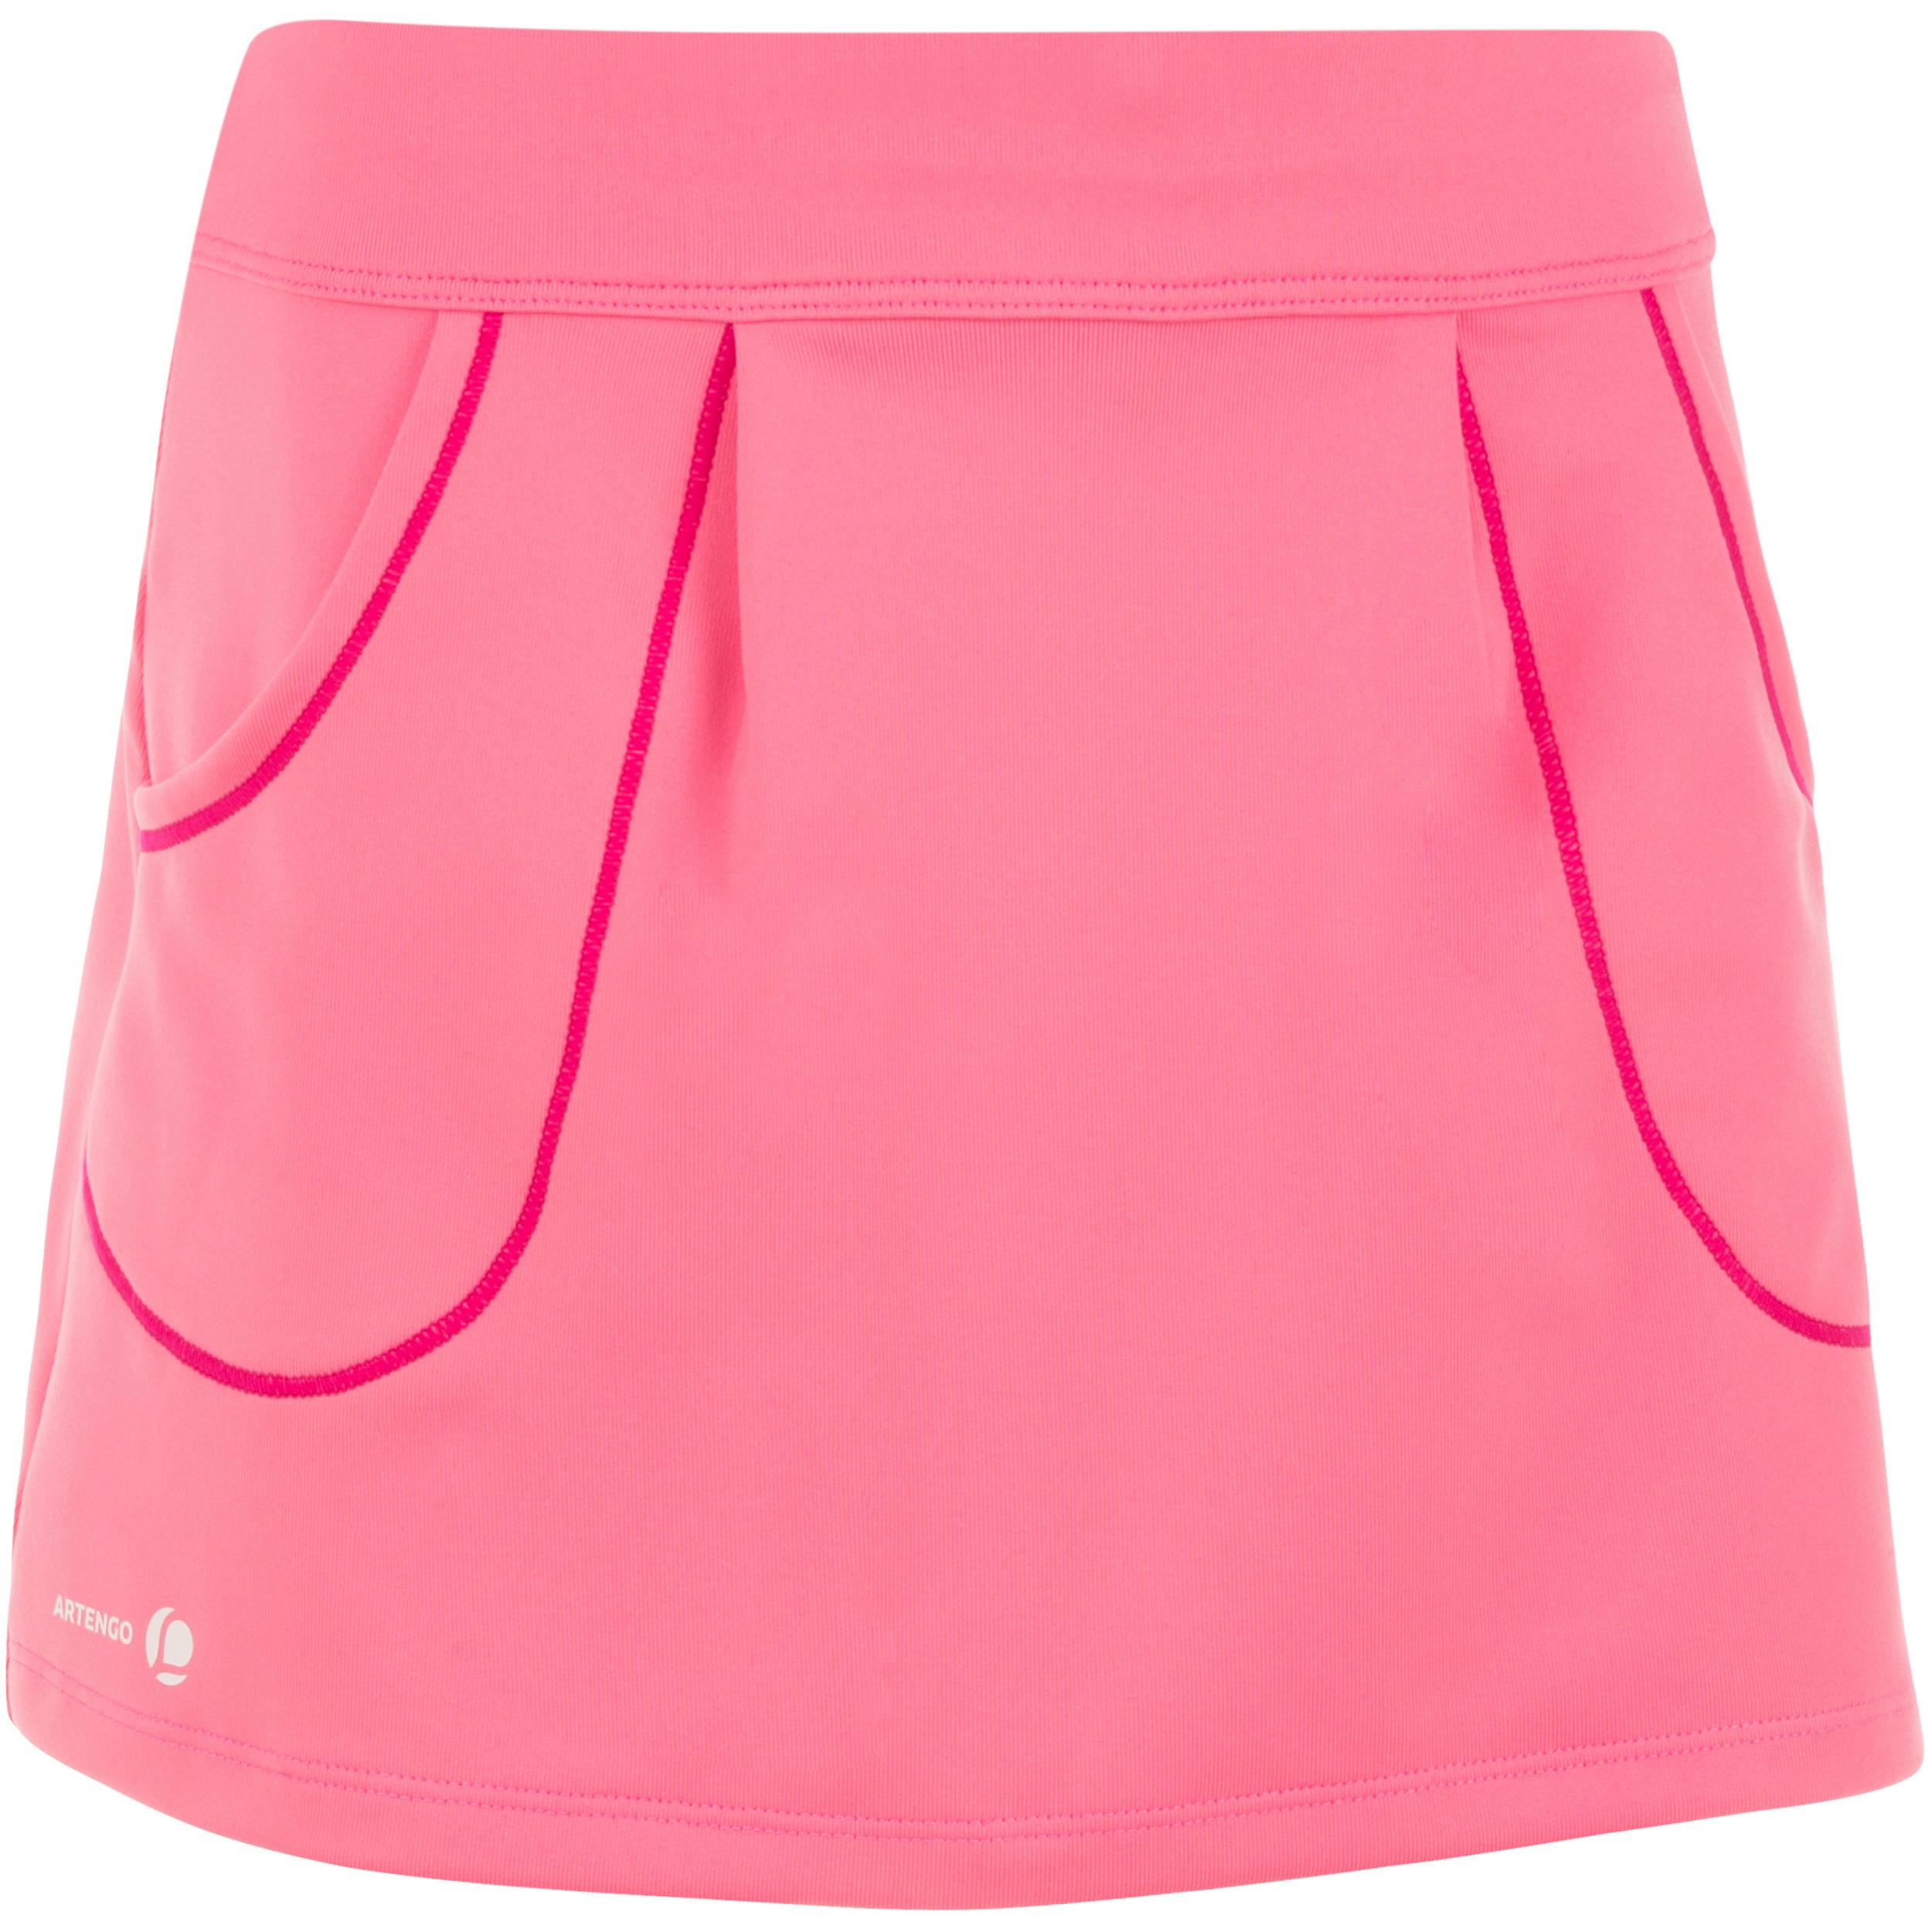 Pocket 100 Girls' Tennis Badminton Padel Table Tennis Squash Skirt - Pink